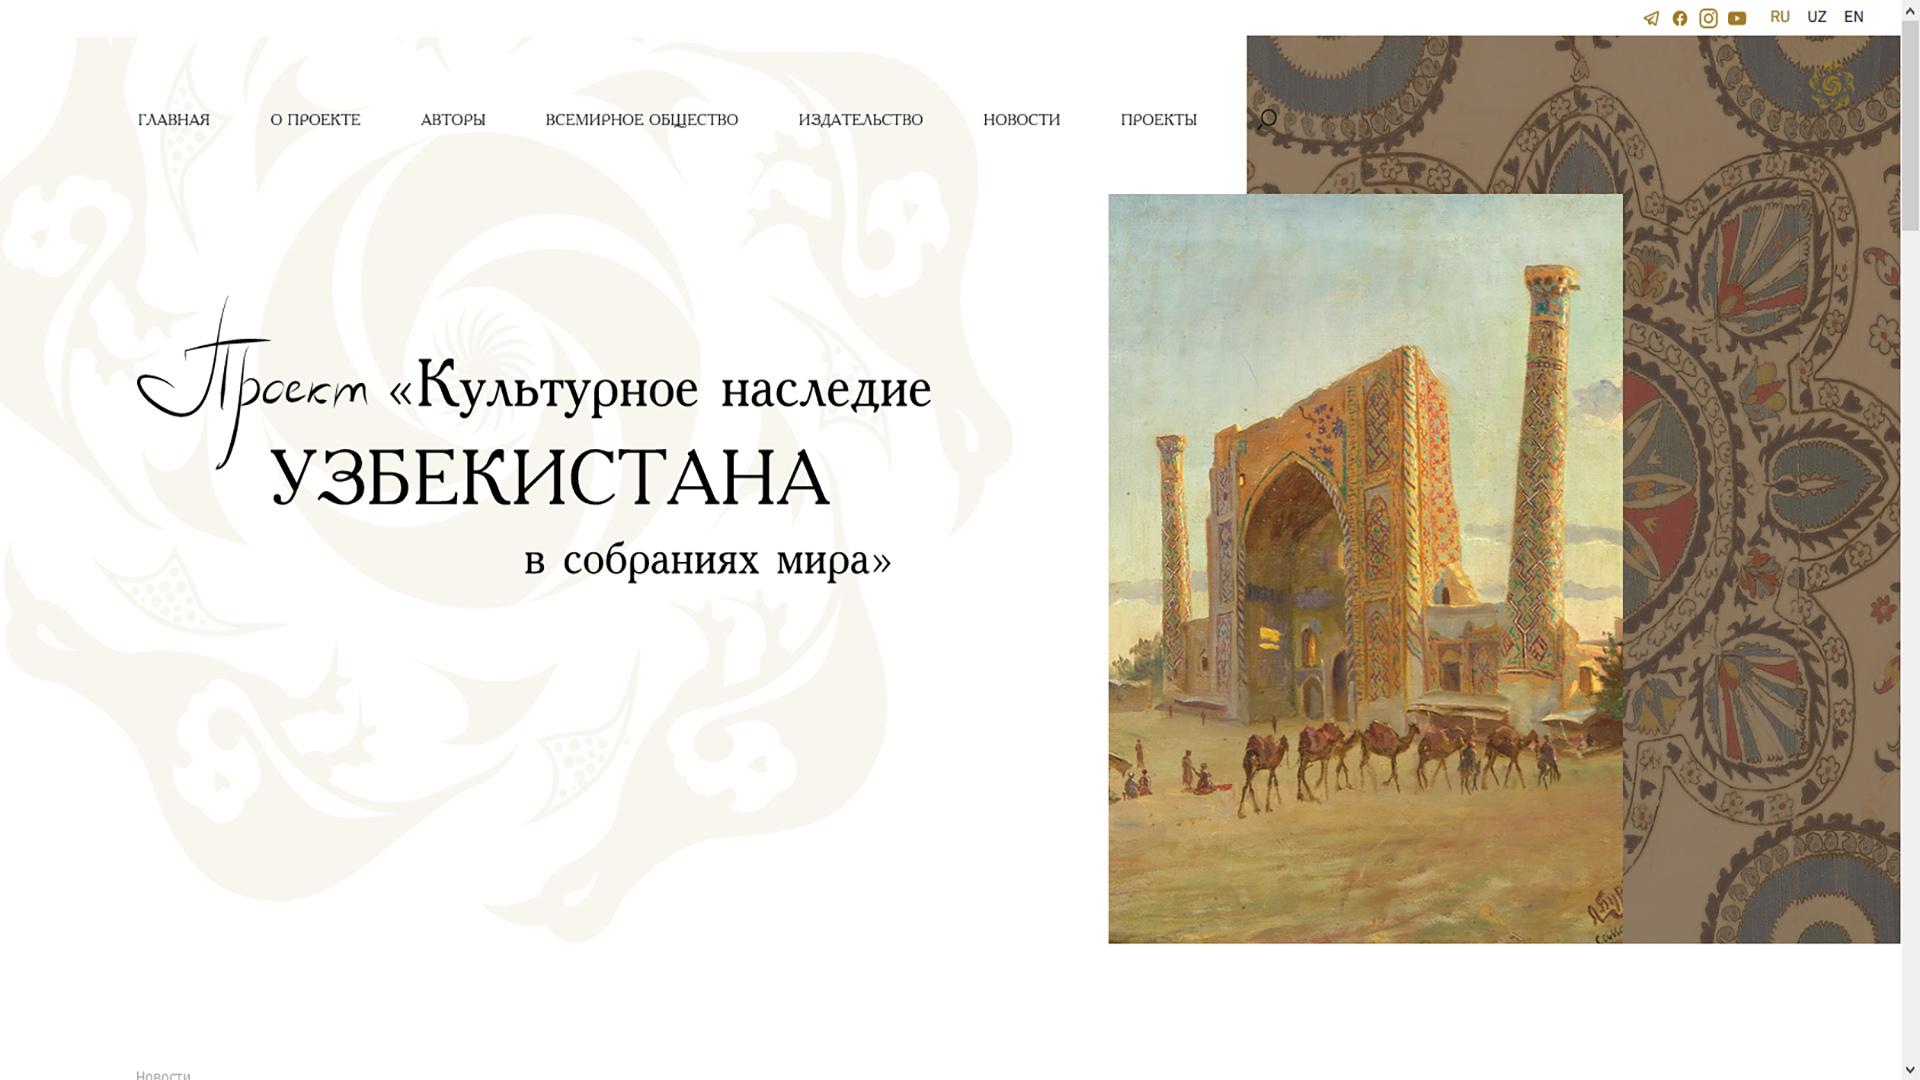 Website: Cultural legacy of Uzbekistan